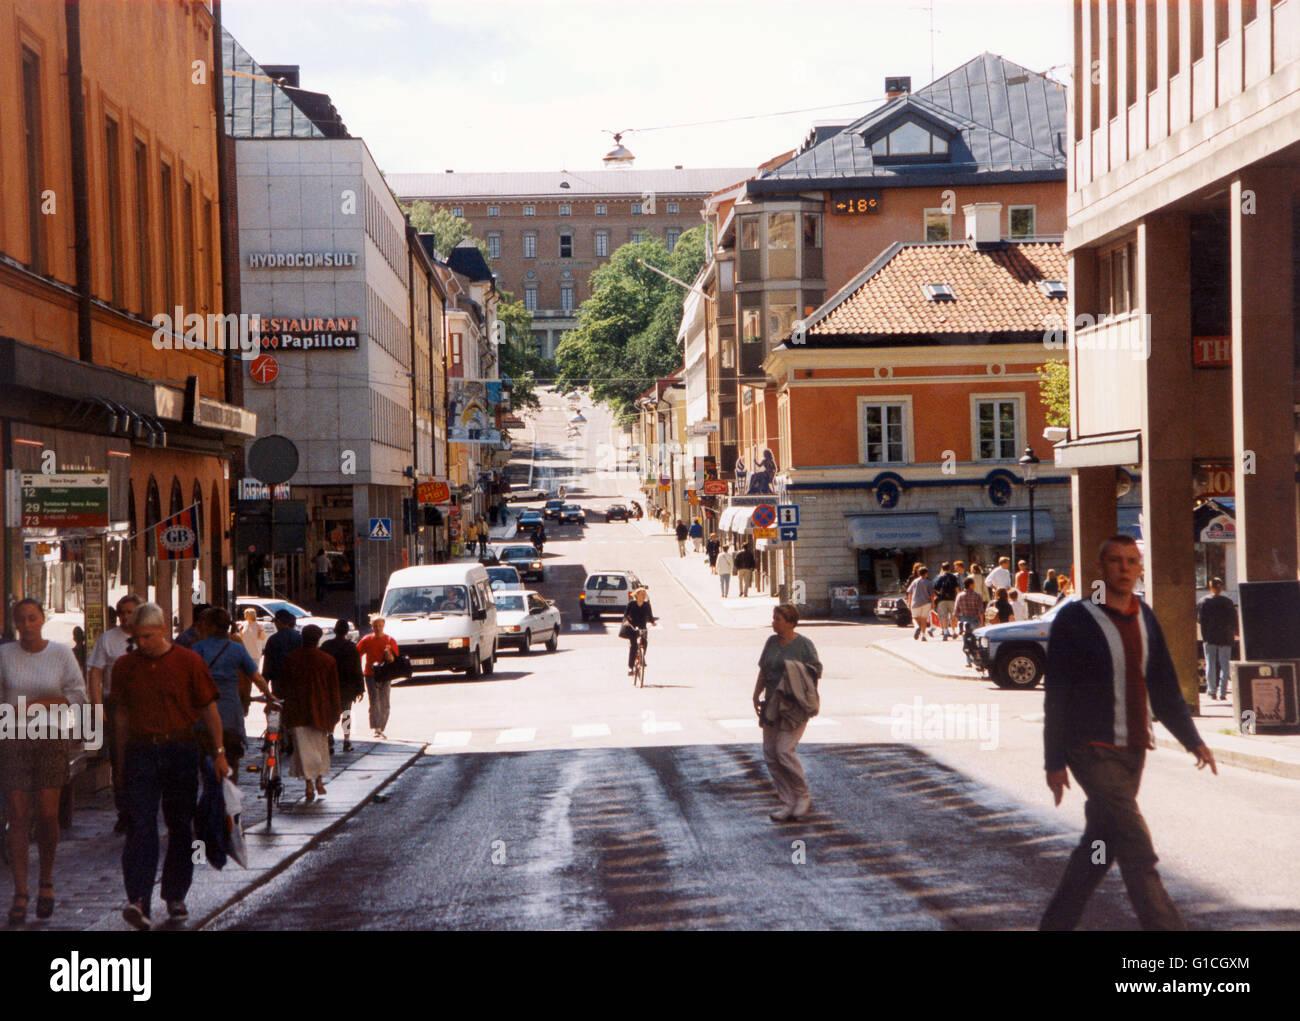 Carolina Rediviva Historical library at Uppsala University Stock Photo